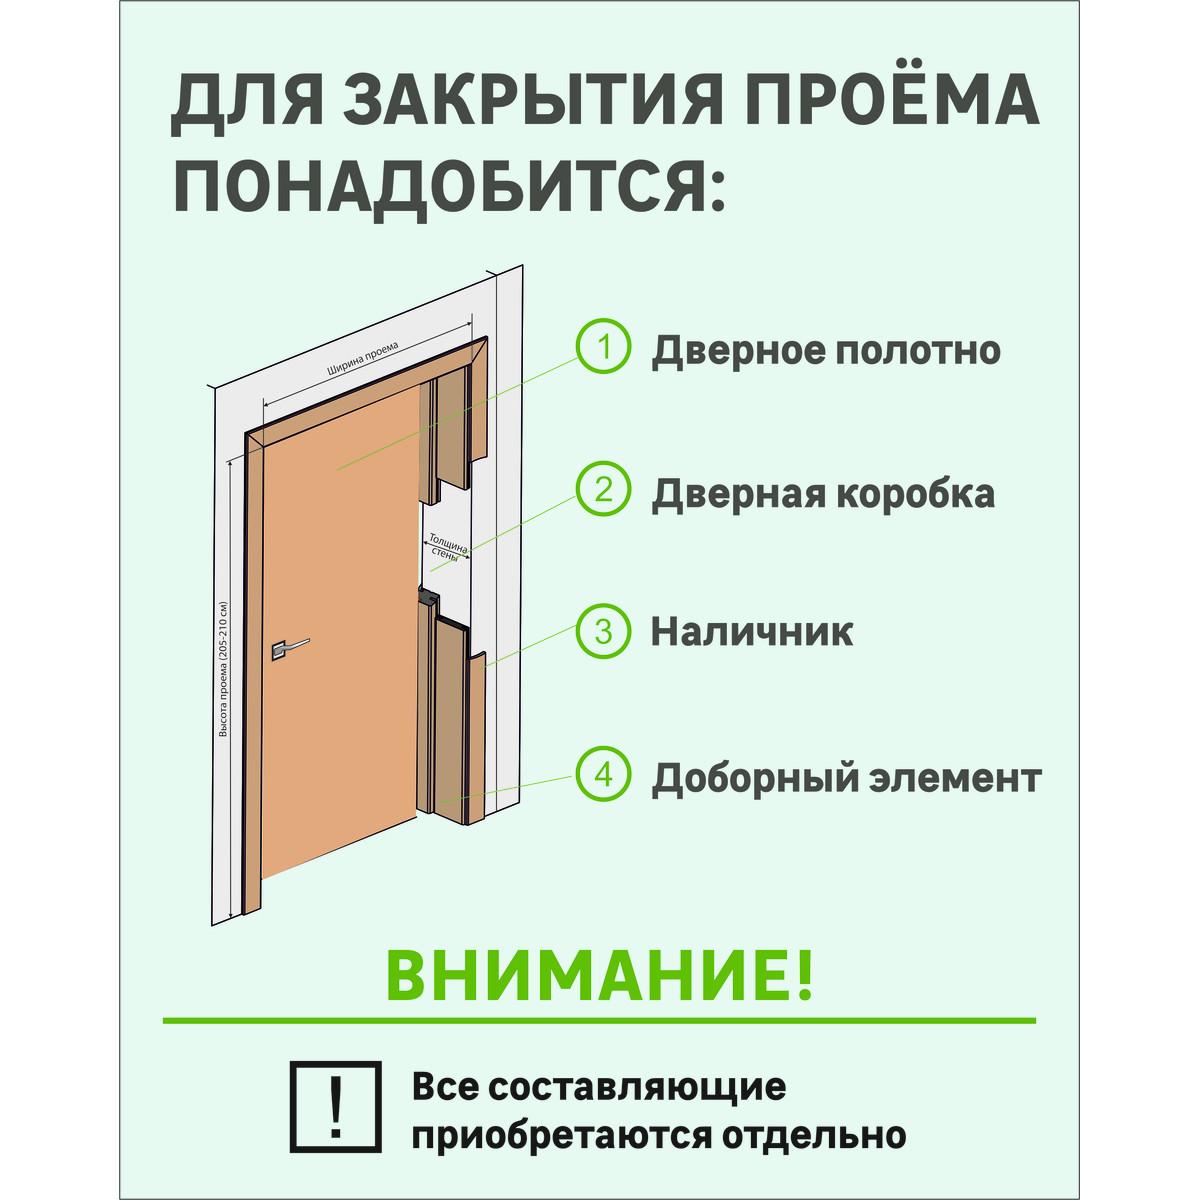 Дверь Межкомнатная Глухая С Замком В Комплекте Афина 60x200 Экошпон Цвет Белый